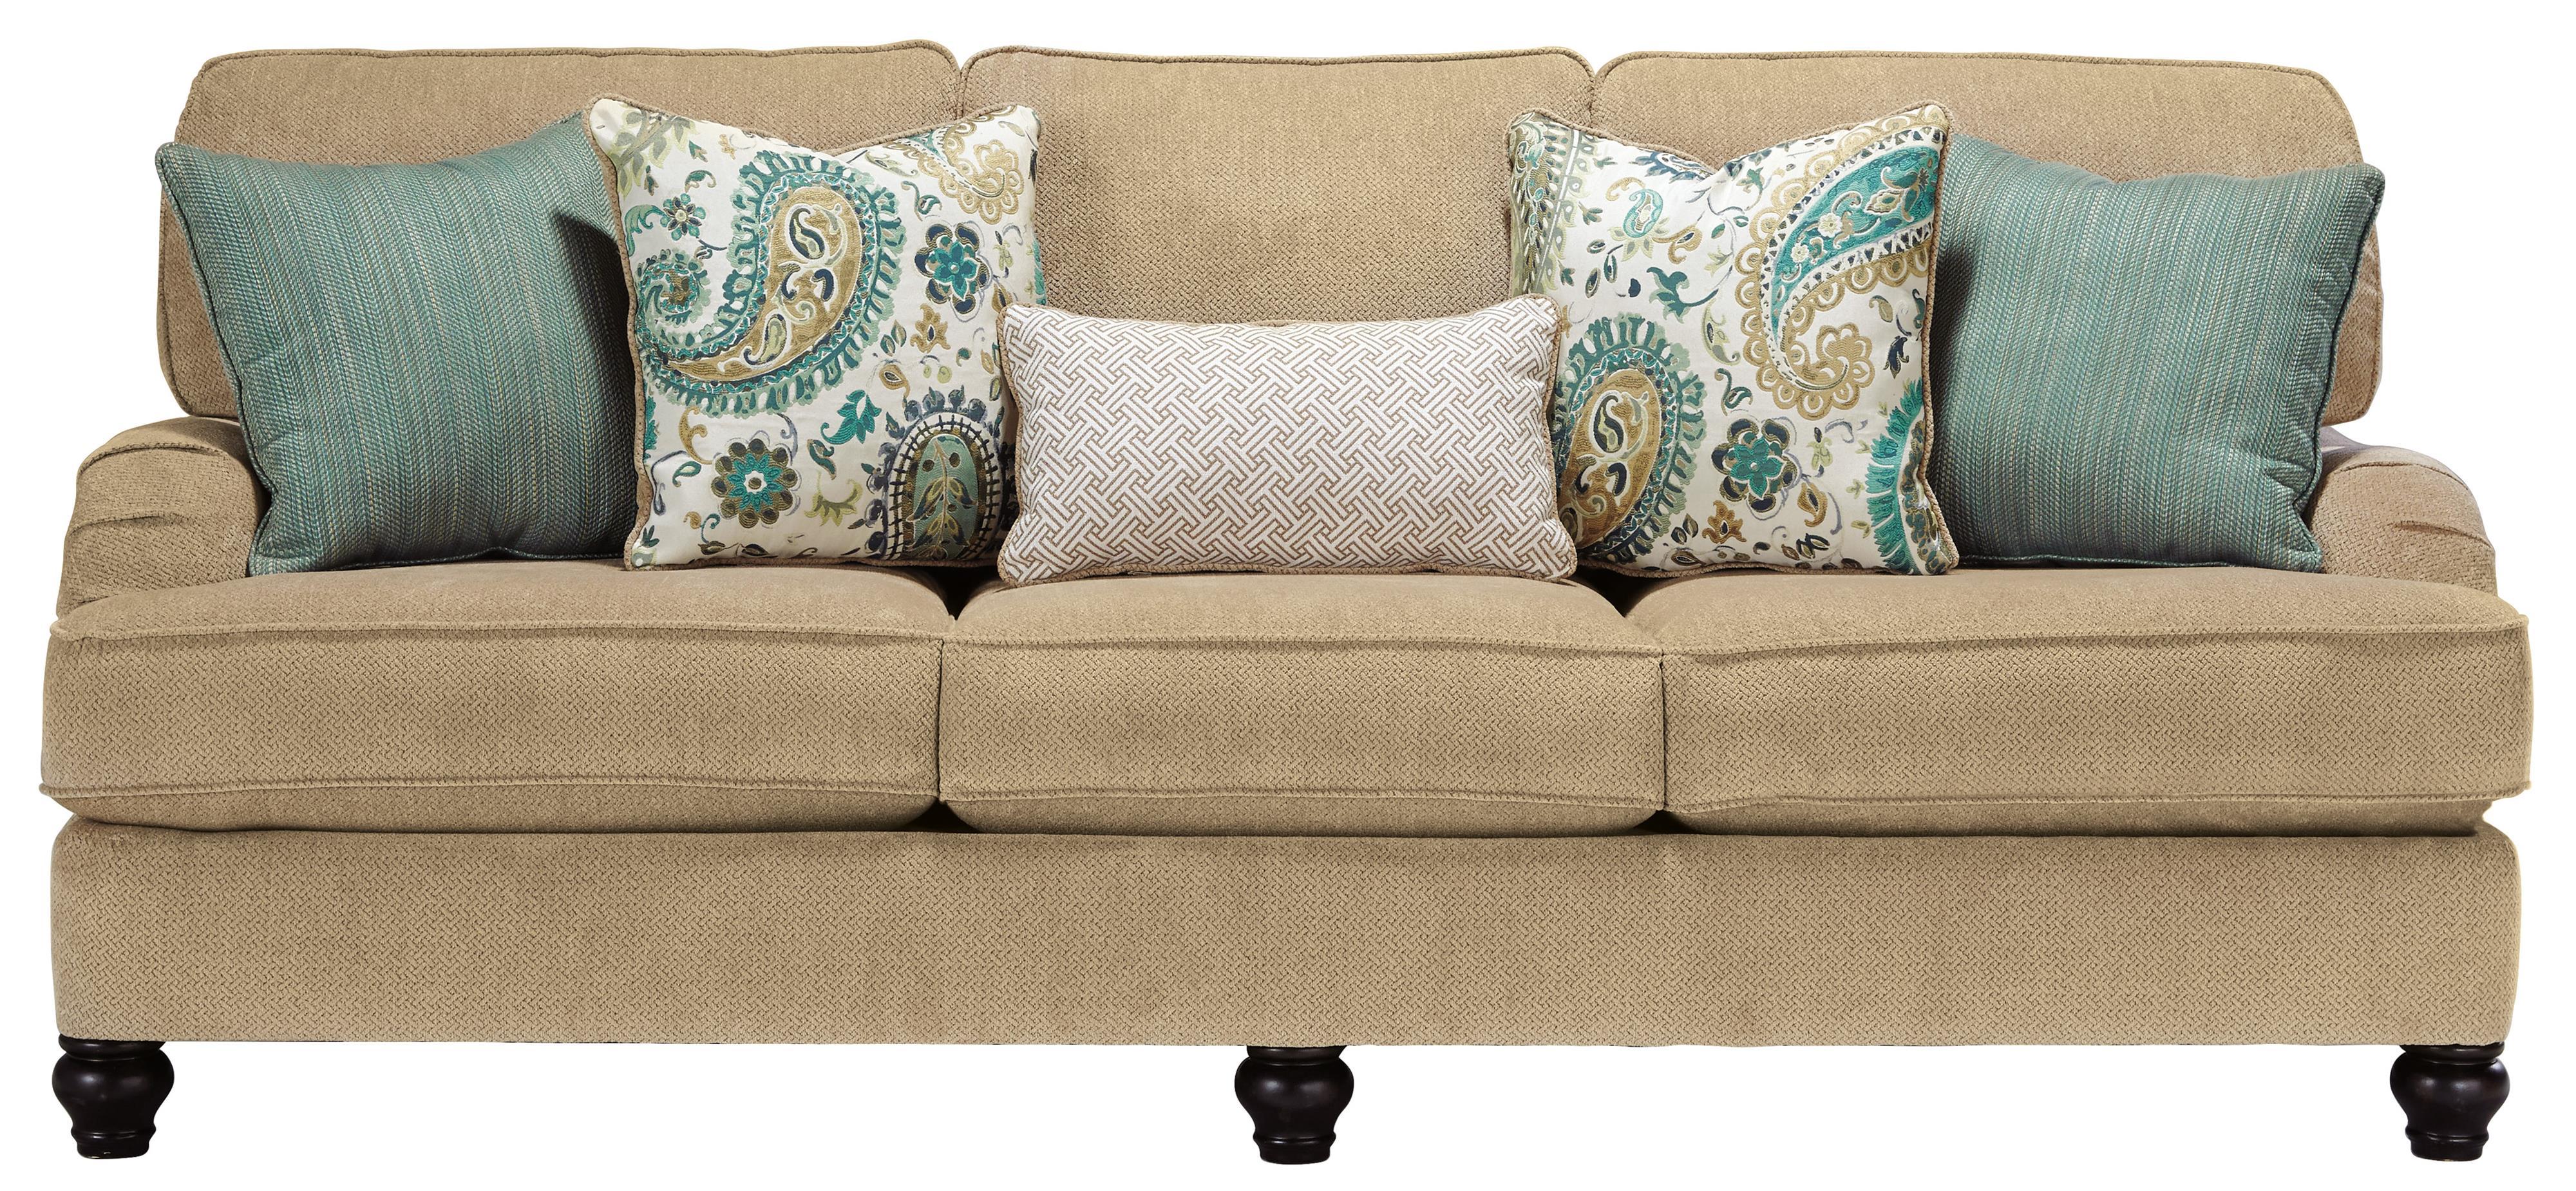 Benchcraft Lochian Sofa - Item Number: 5810038